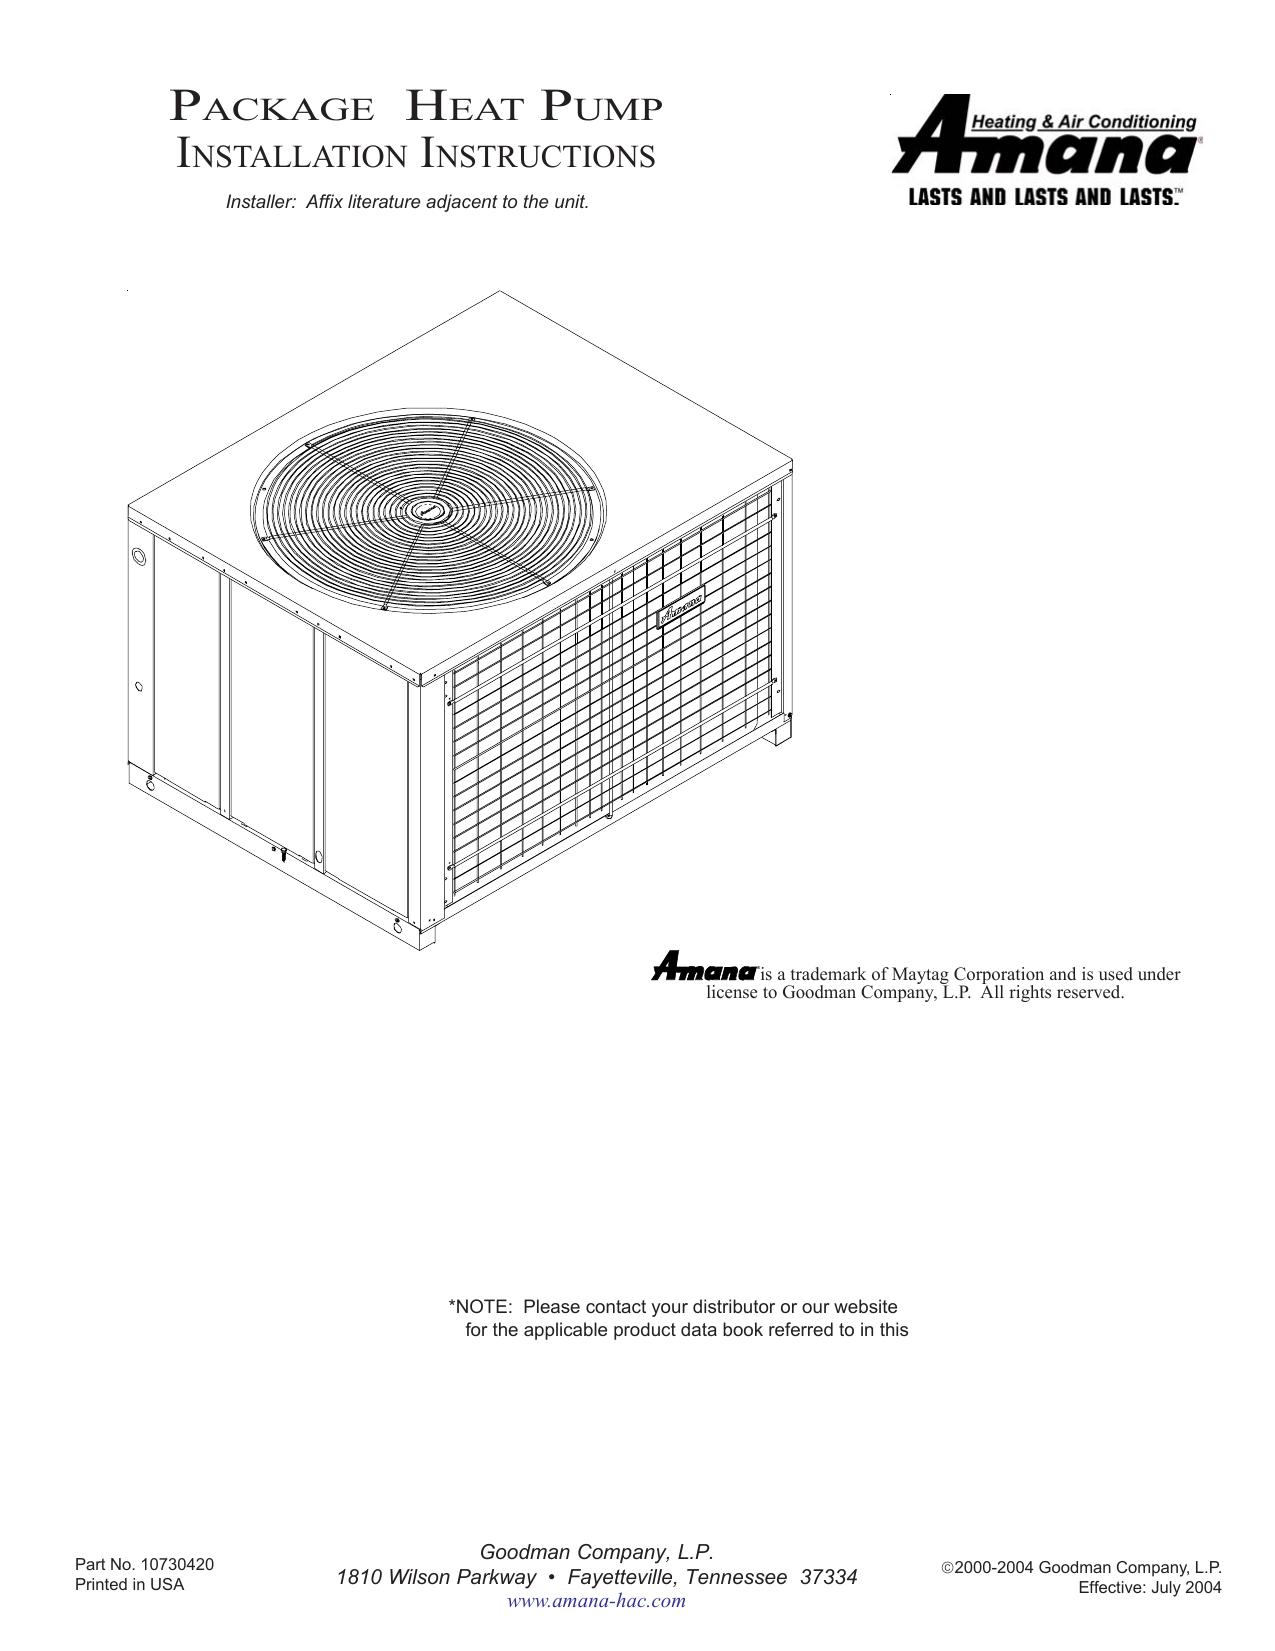 Amana PHD48 Product data